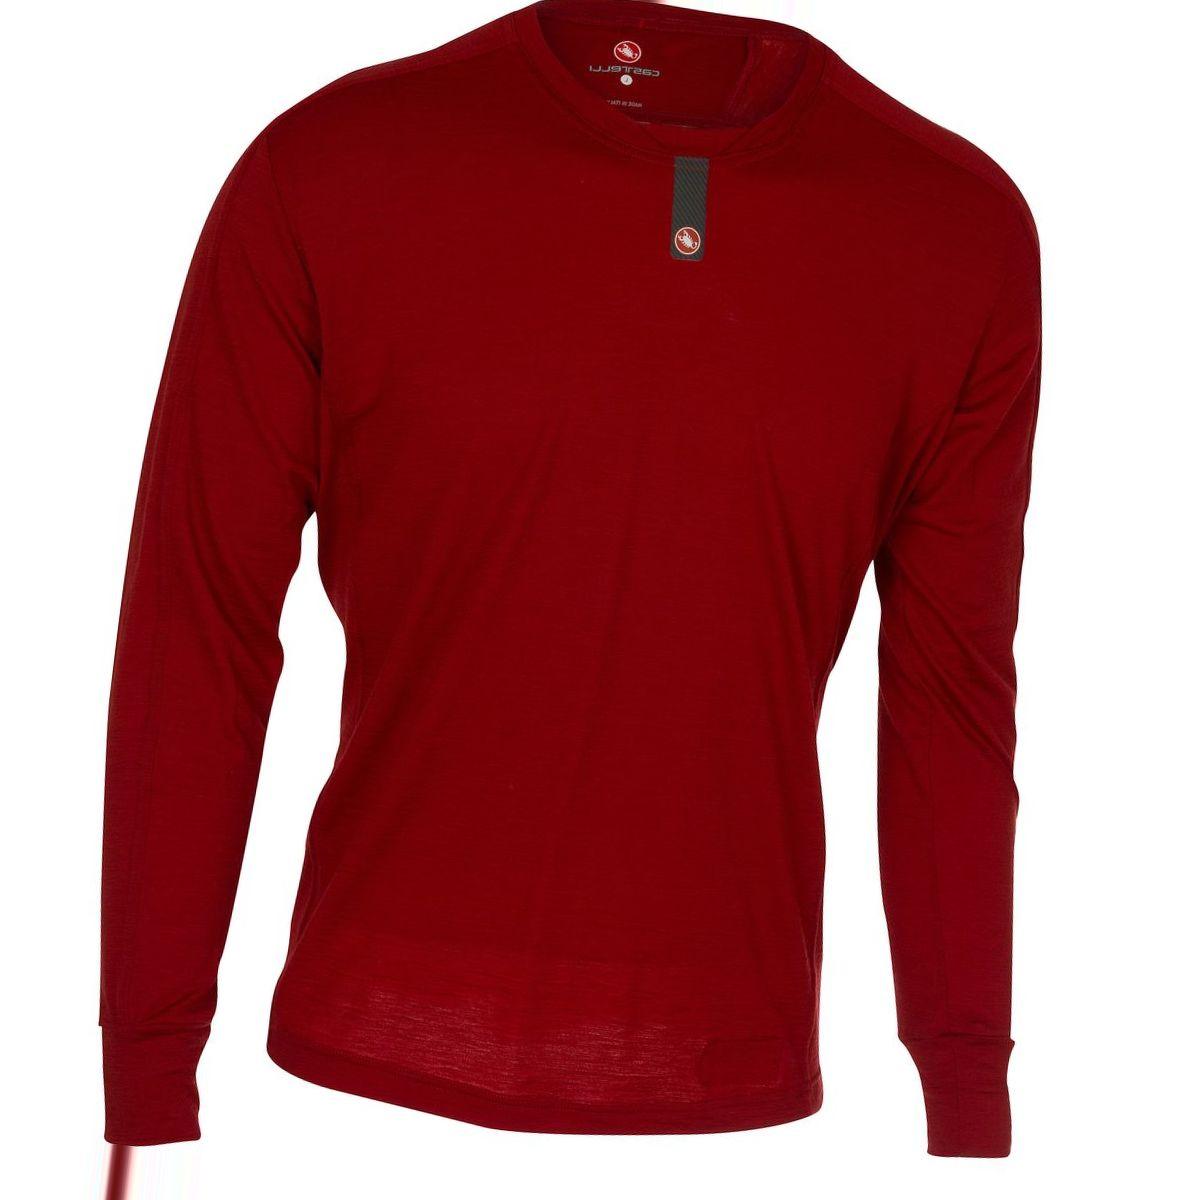 Castelli Procaccini Wool Long-Sleeve Baselayer - Men's